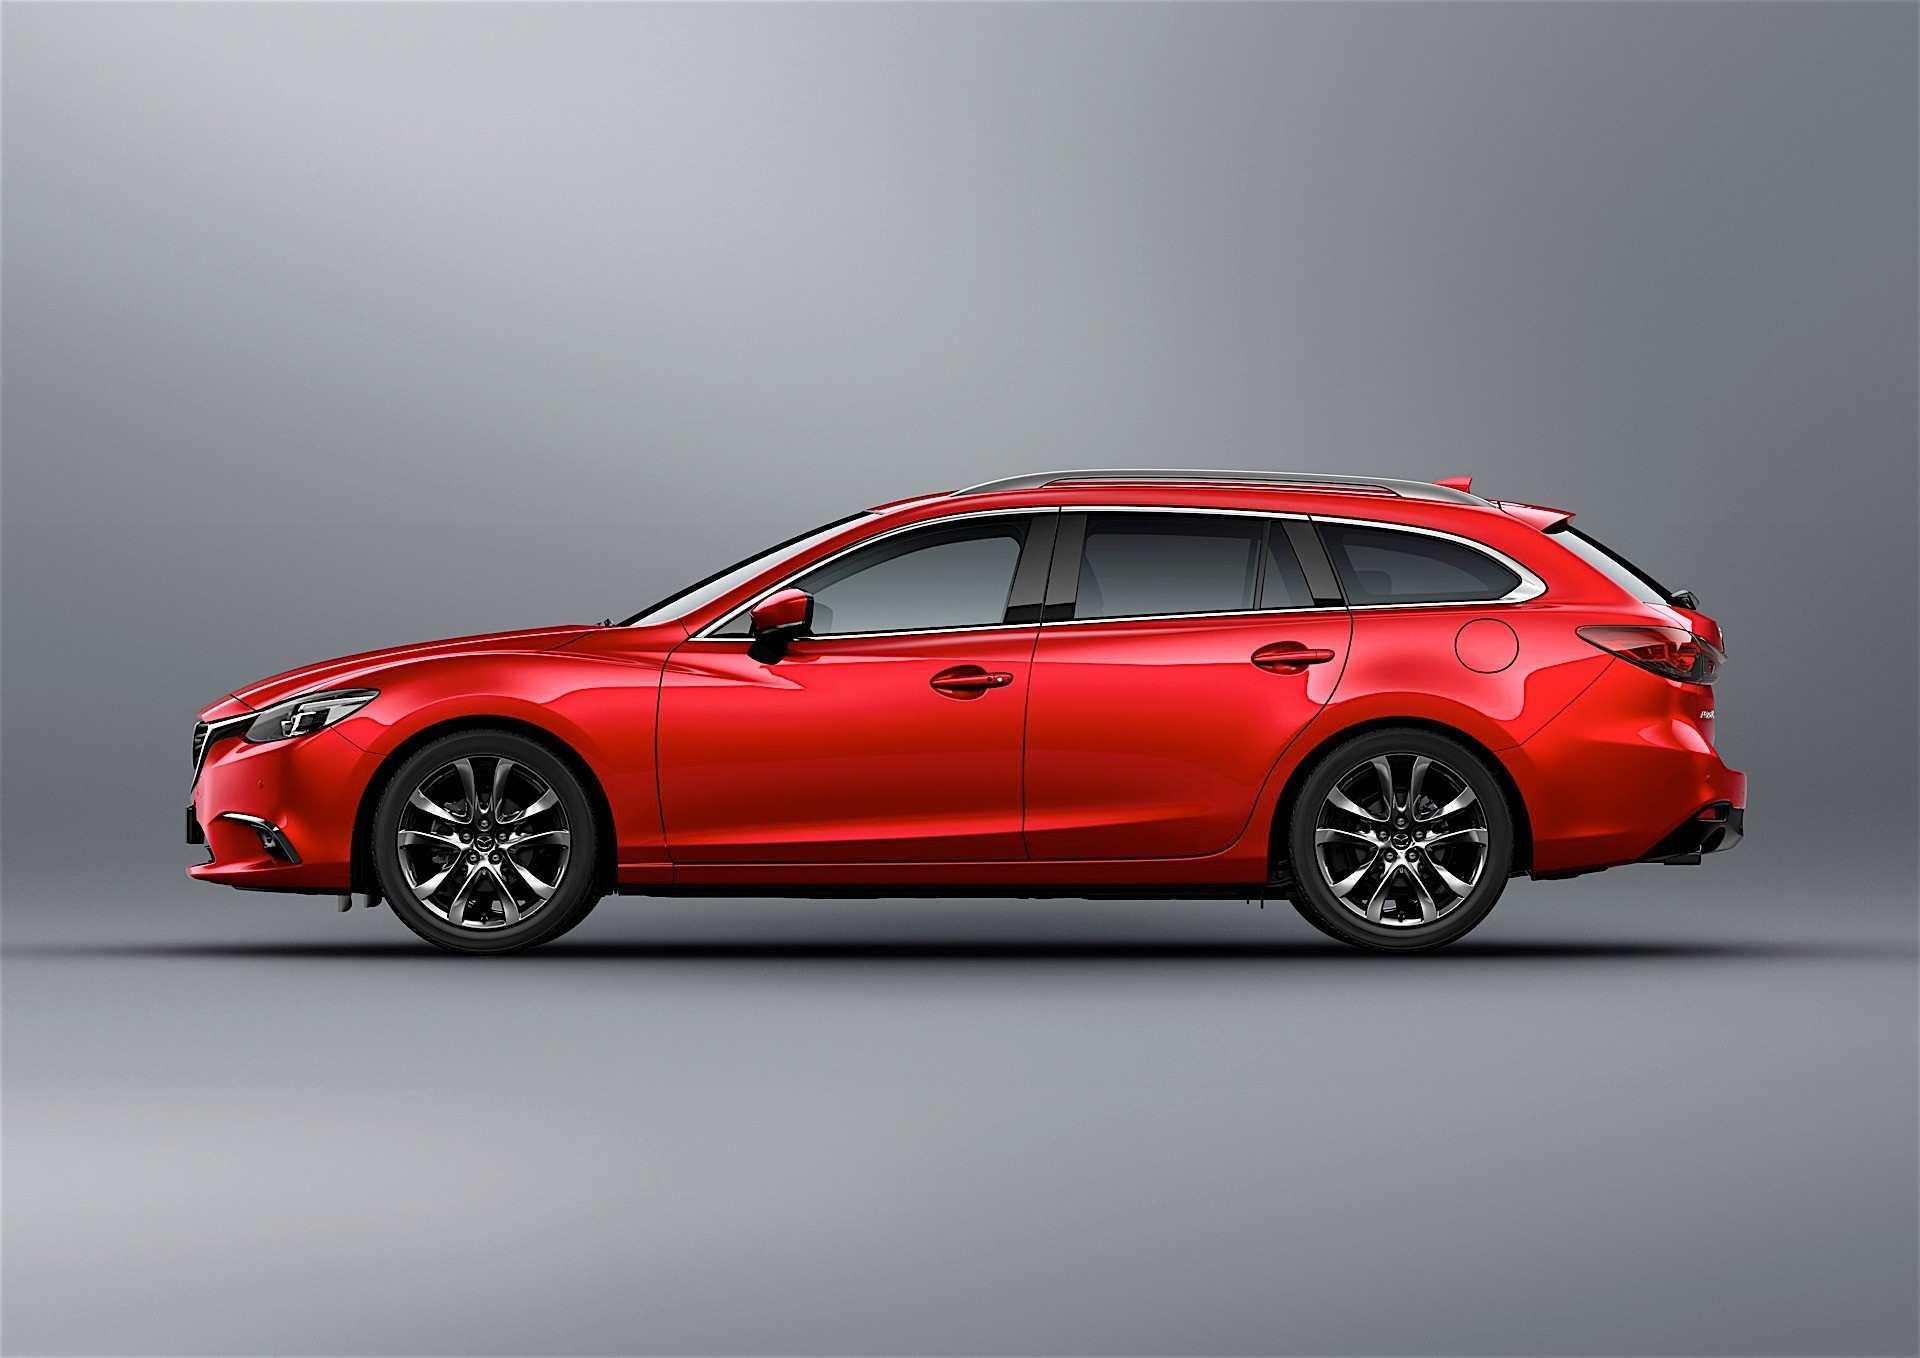 65 All New Next Gen Mazda 6 2020 Pictures for Next Gen Mazda 6 2020